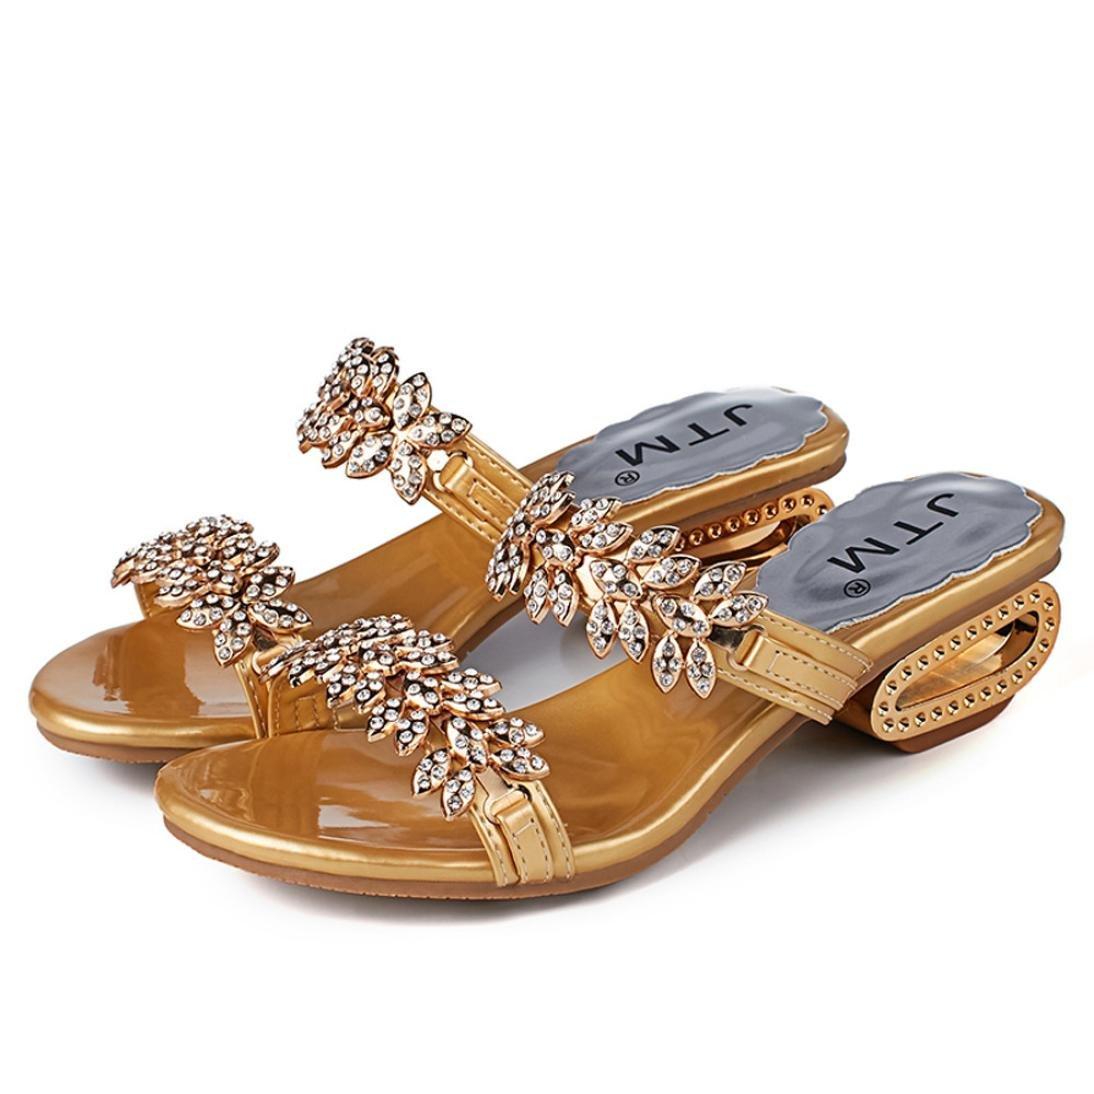 Sandali Donna,Witsaye Eleganti Estivi Donna Pantofole Ciabatte Tacco Medio Pantofole Scarpe da Spiaggia Ragazze InfraditoOro